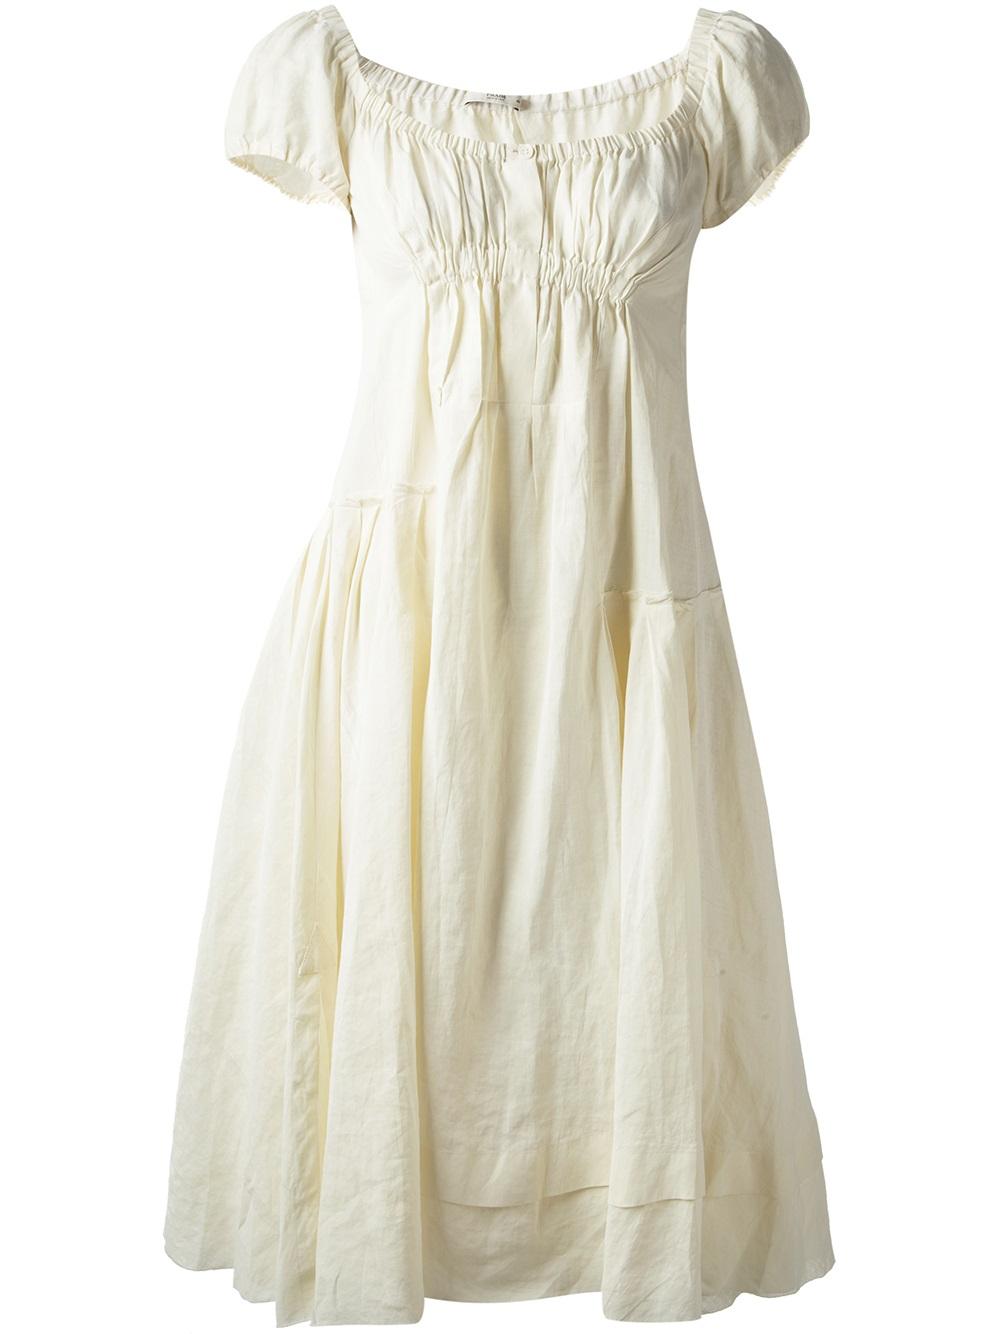 Lyst - Prada Off The Shoulder Dress in White dc54e75021